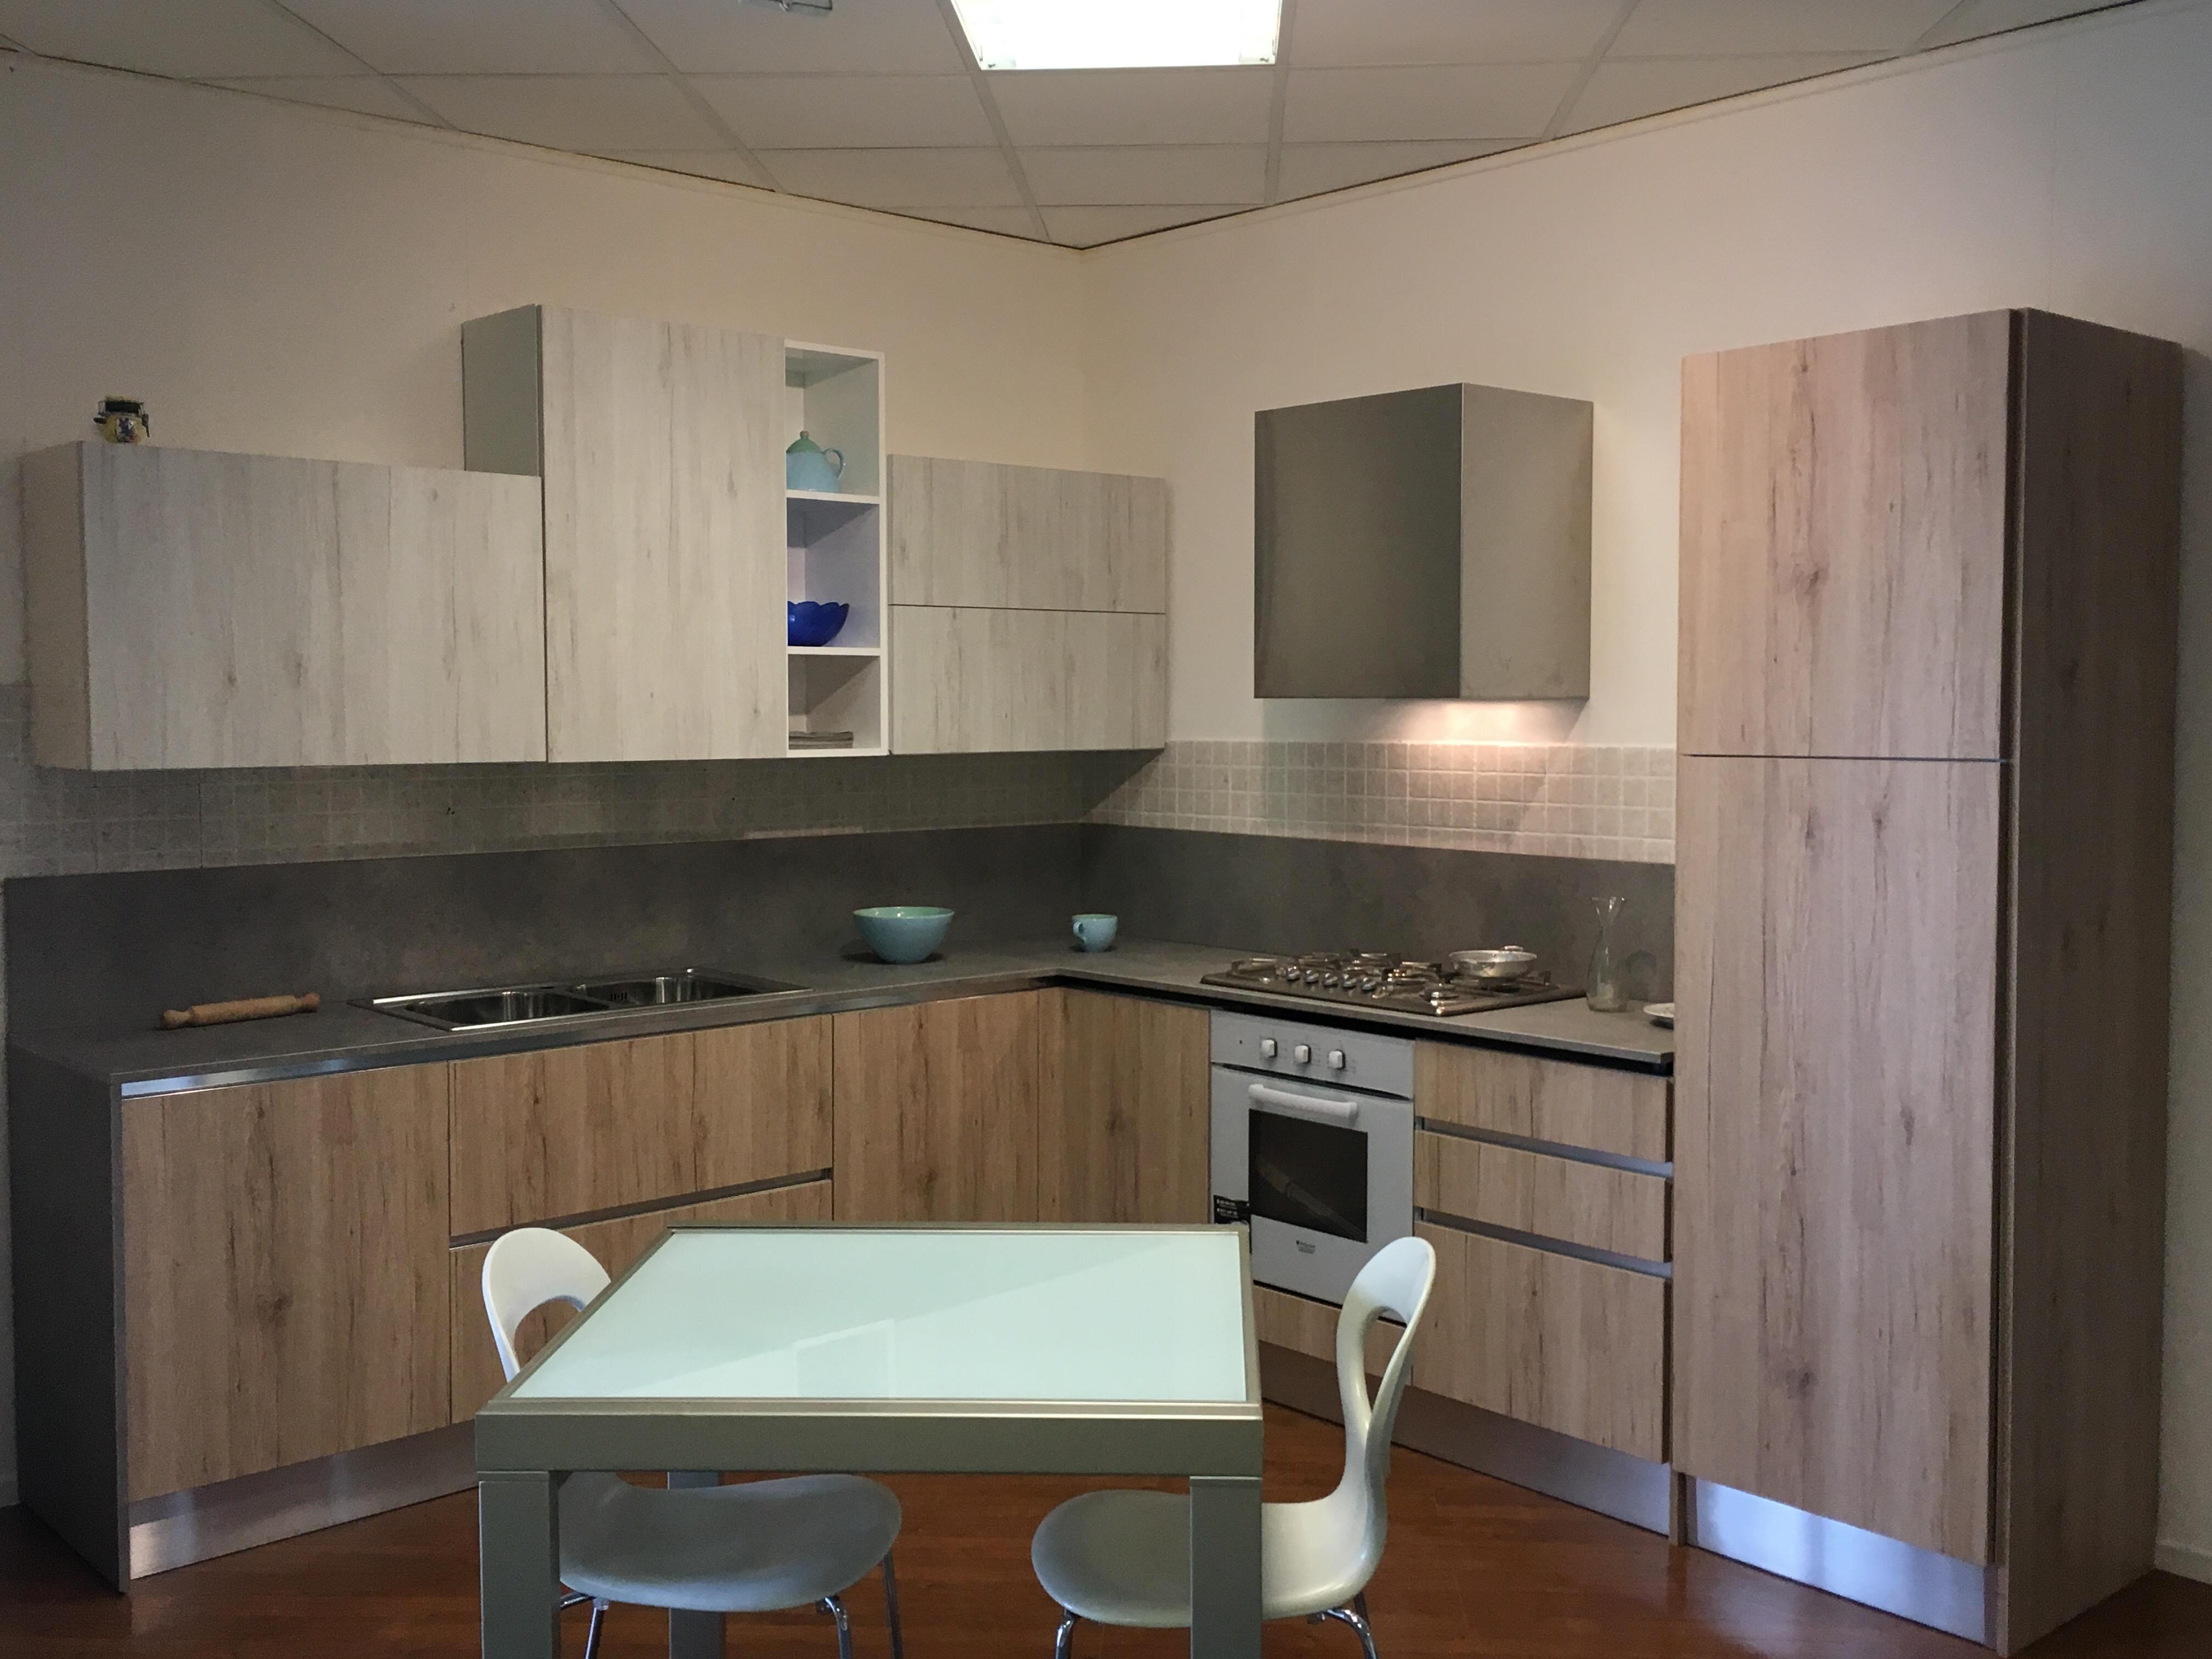 Cucina astra cucine sp22 in offerta cucine a prezzi scontati - Composizione cucina ad angolo ...